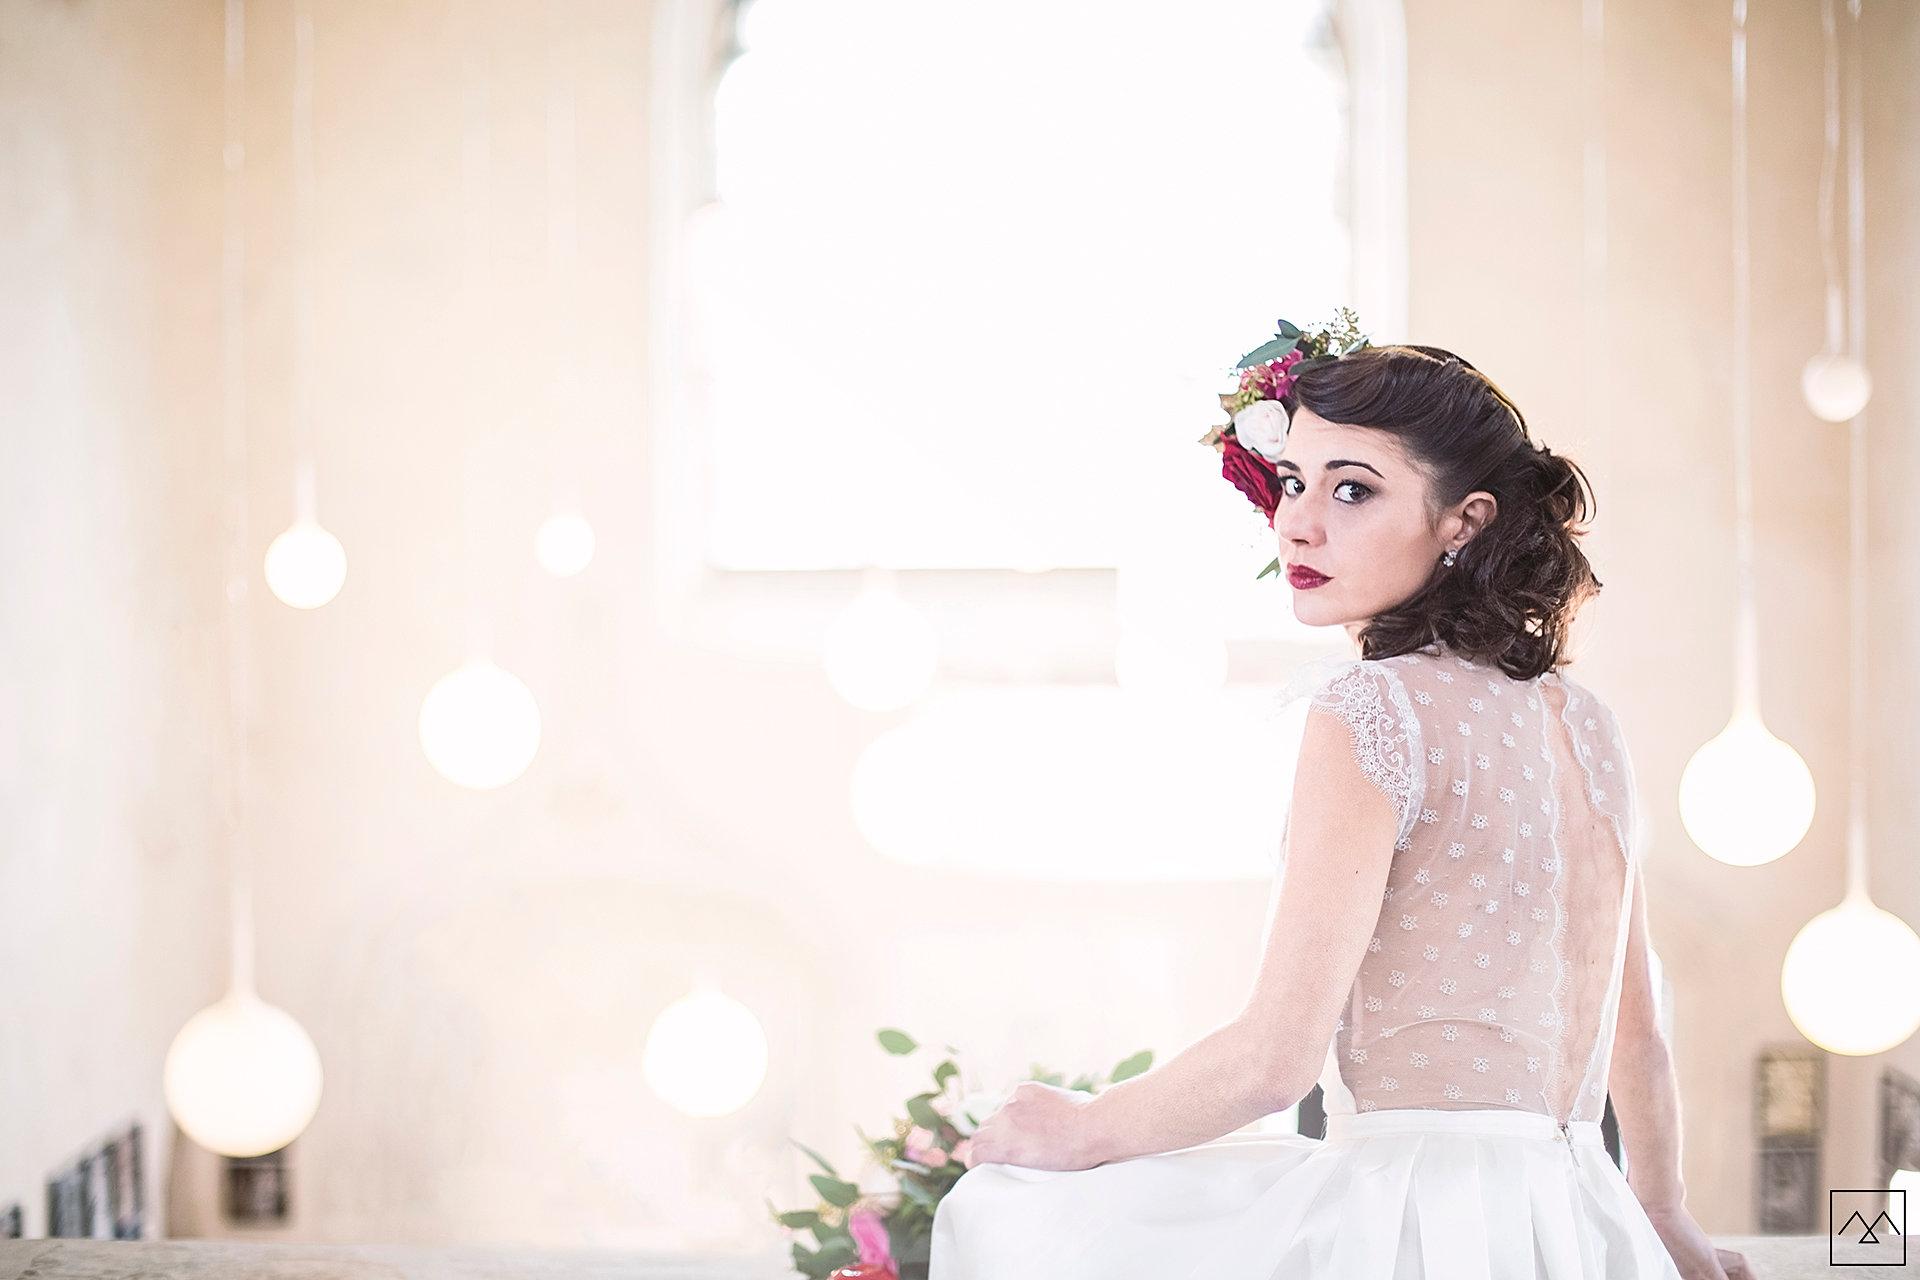 maquillage coiffure lyon 7 anna cruz maquillage et coiffure mariage lyon shooting inspiration collection 2017 - Coiffeuse Maquilleuse Mariage Lyon